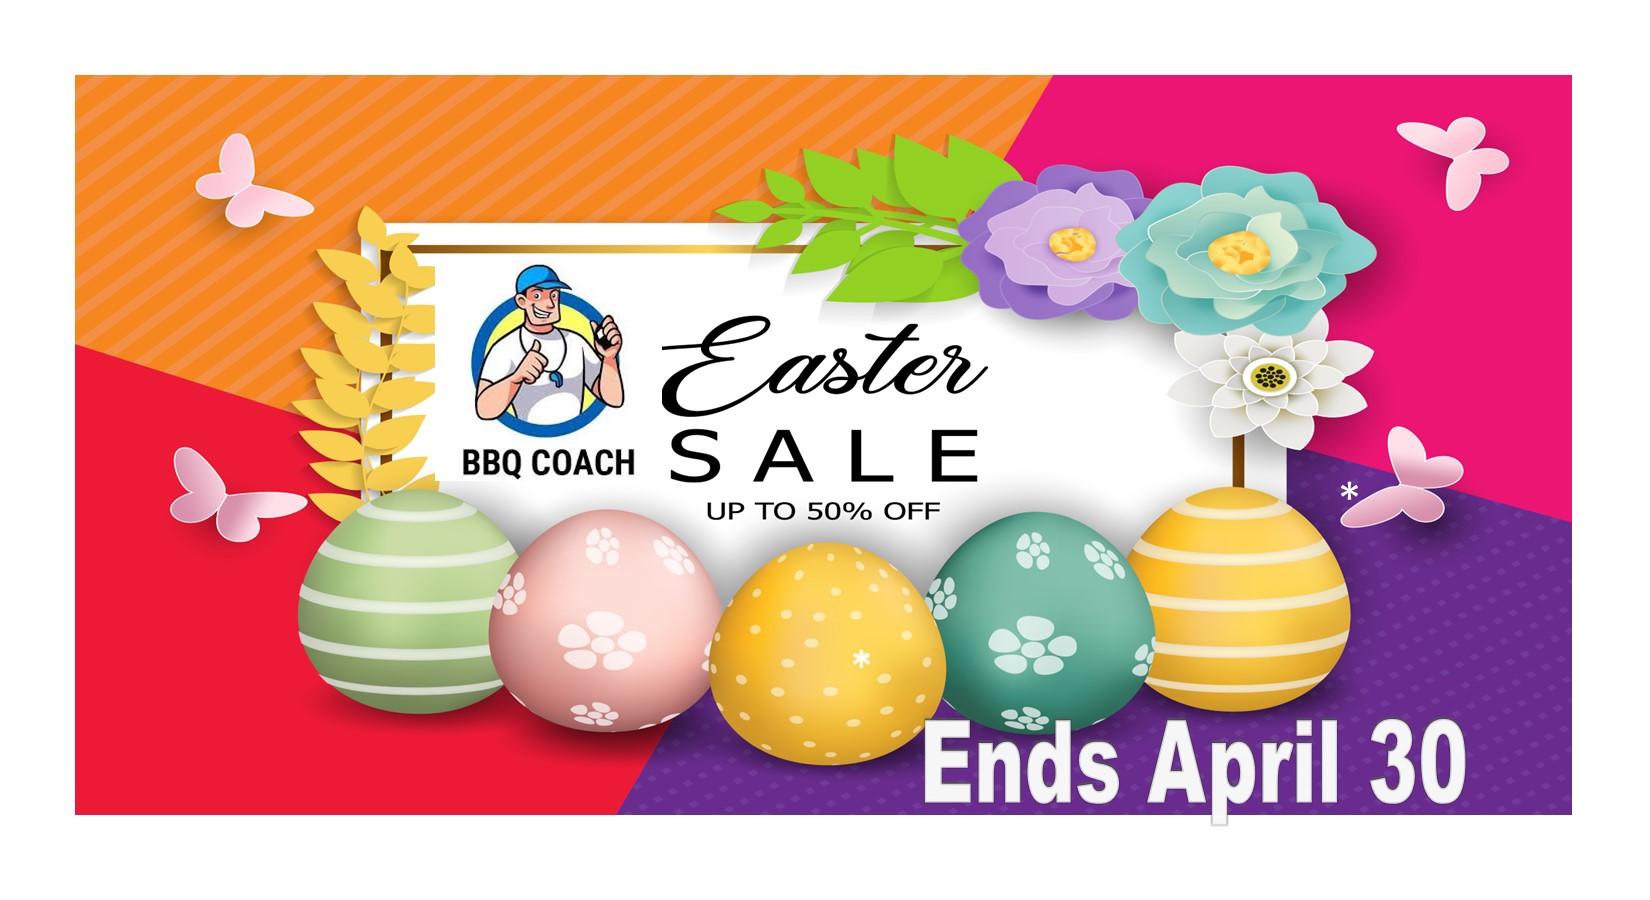 bbq-coach-easter-sale.jpg